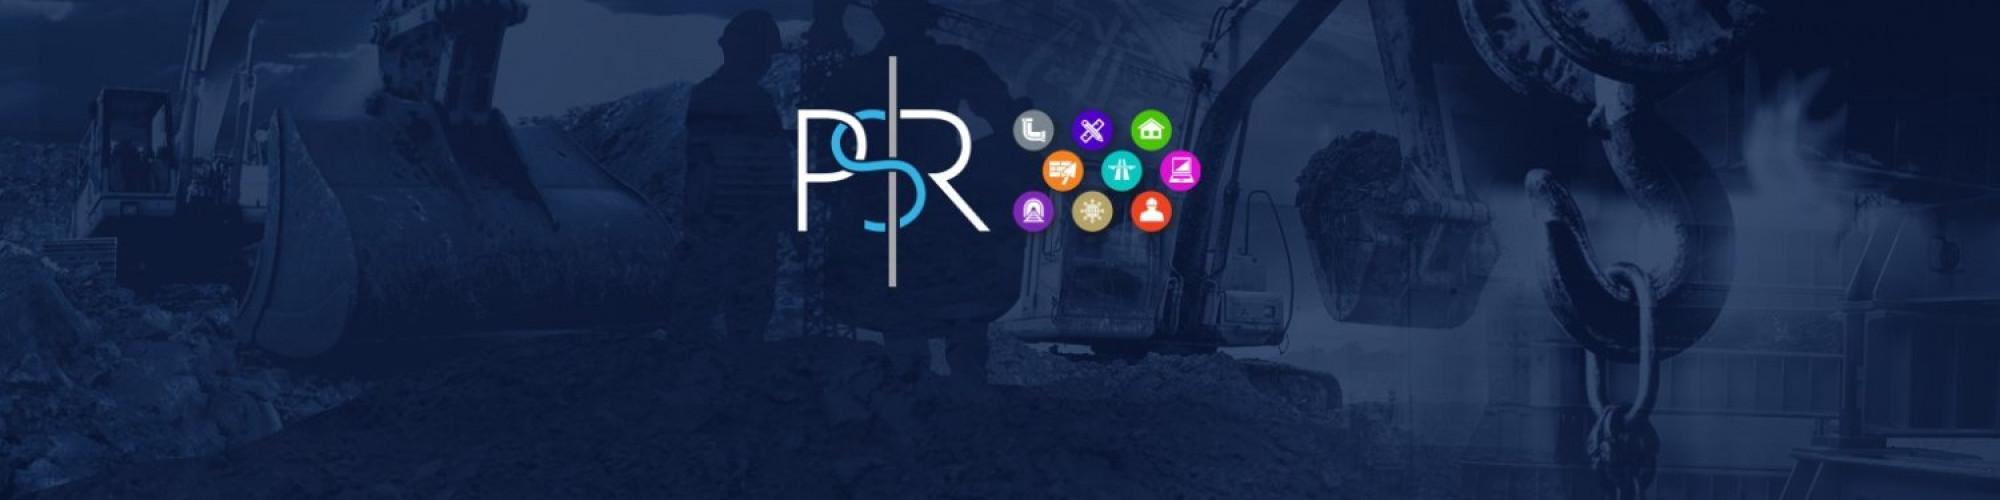 PSR Solutions